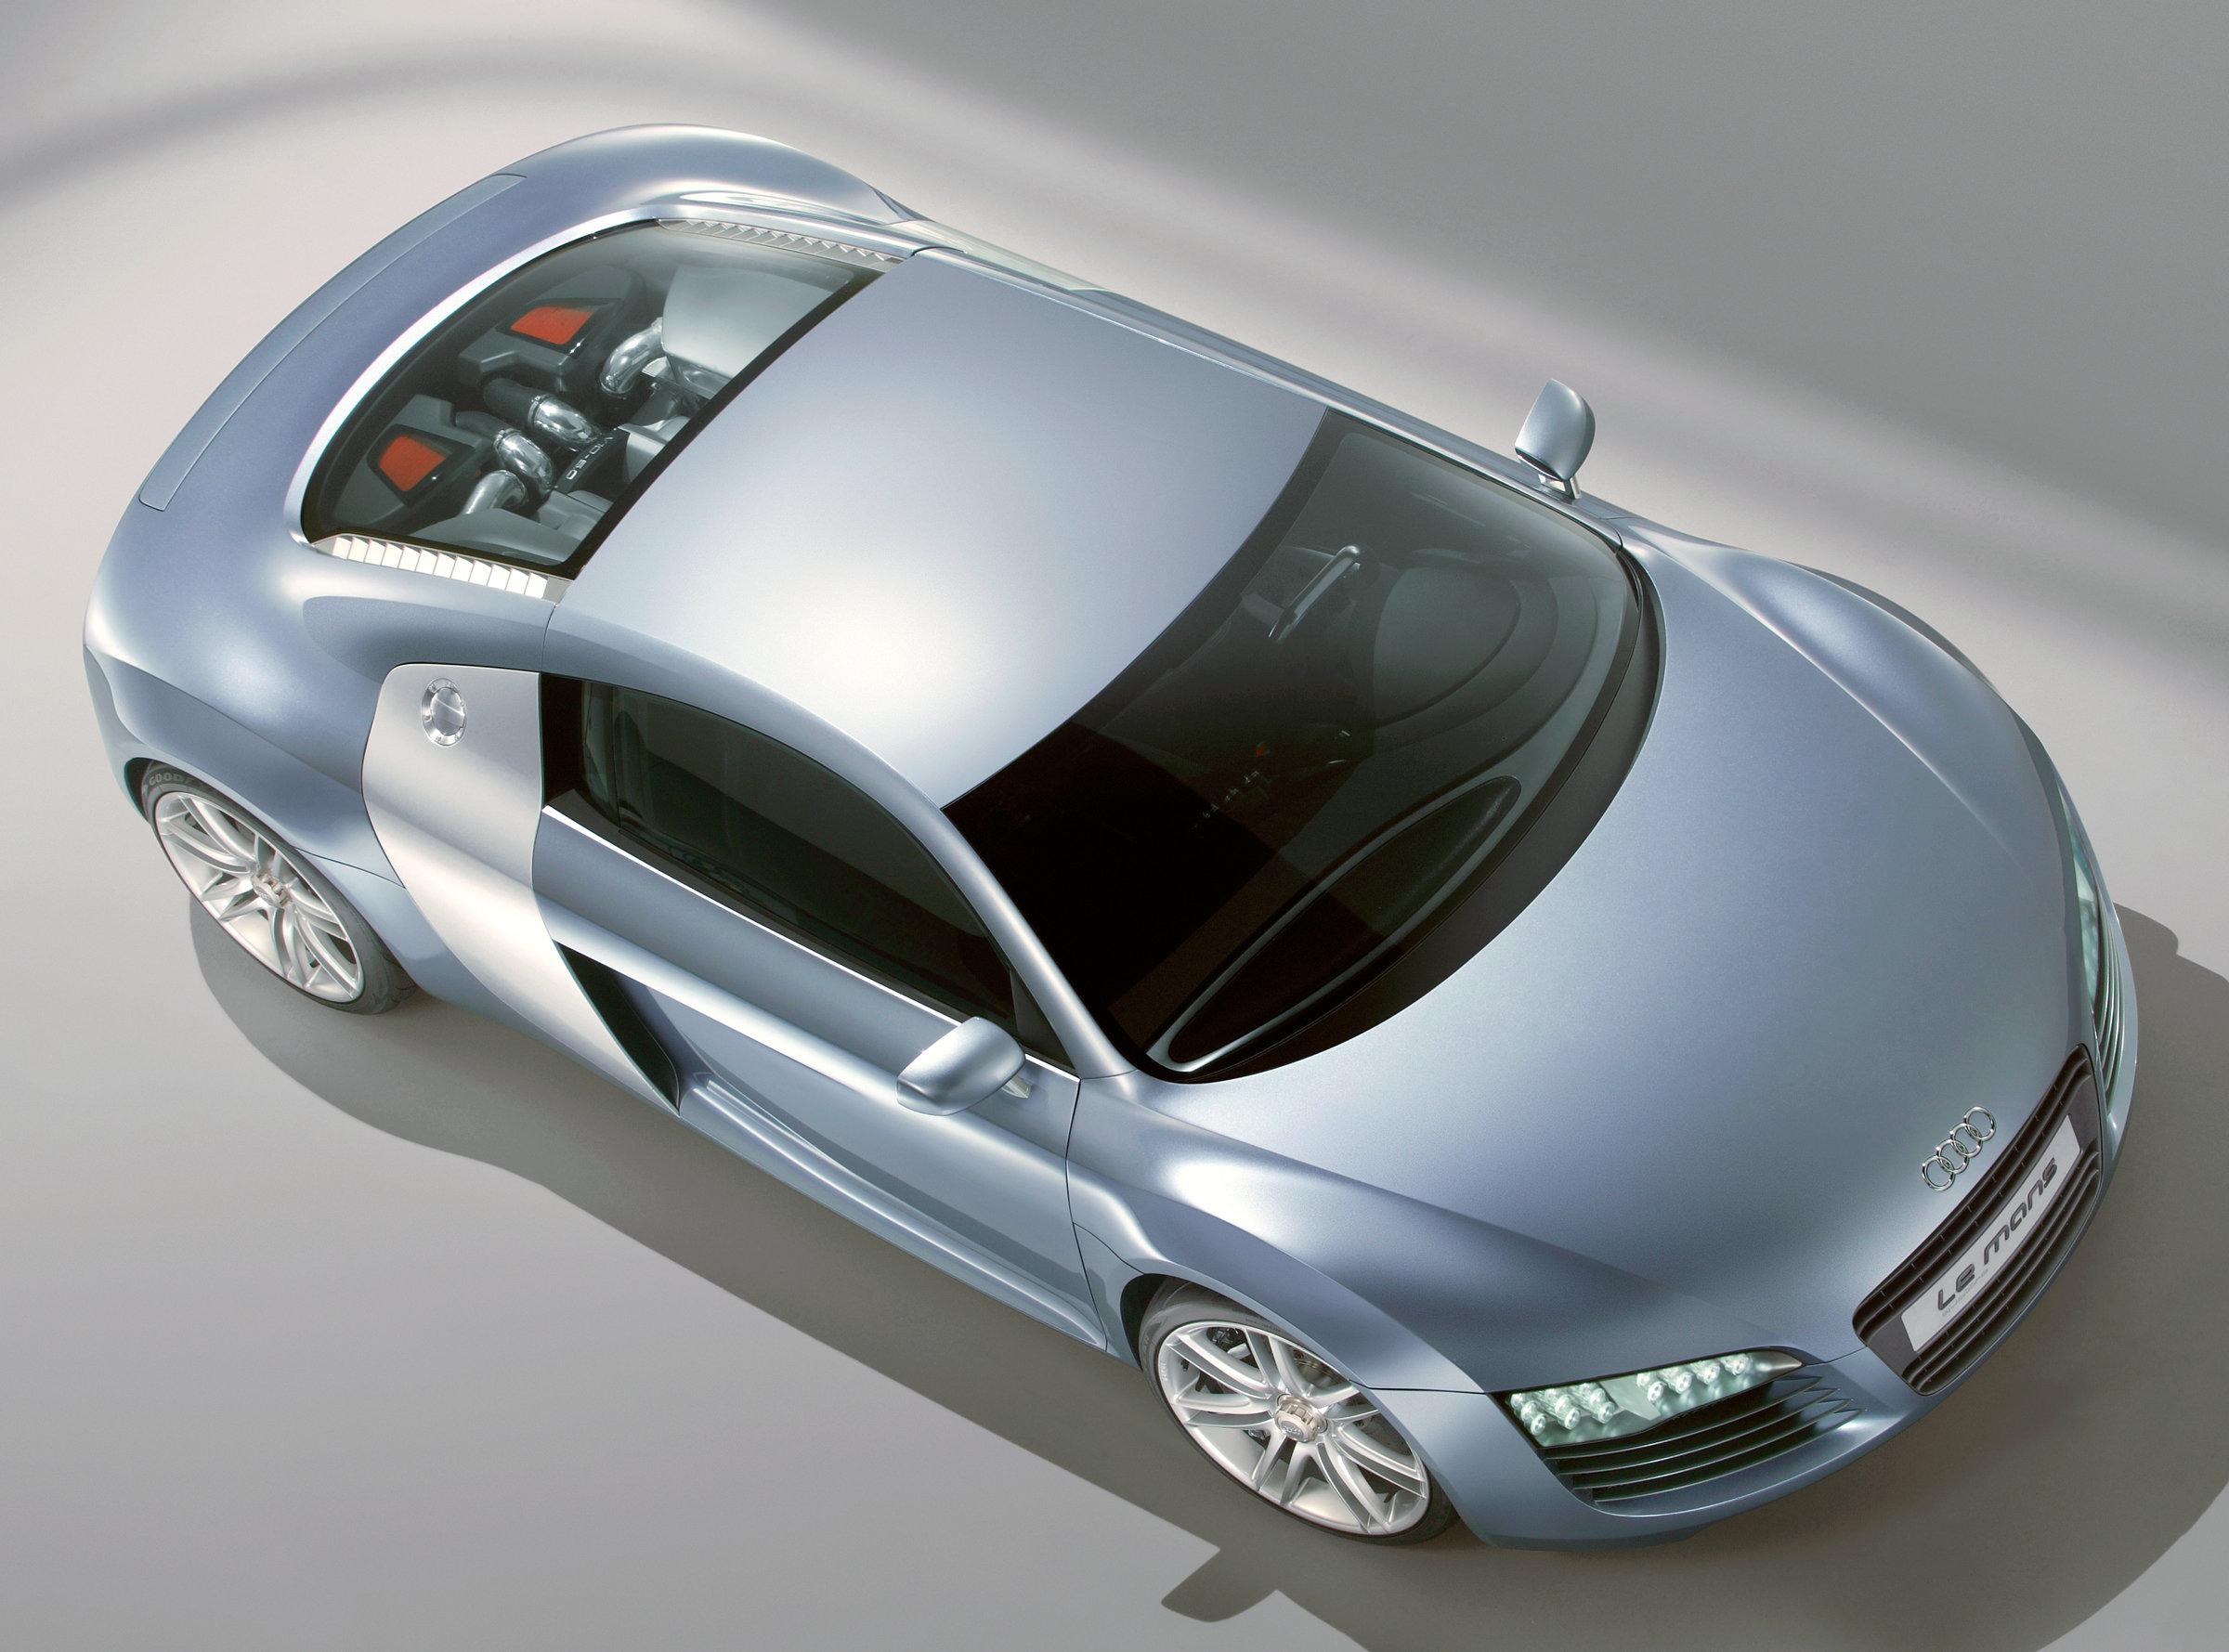 Audi Le-Mans Quattro, вид сверху, Audi, автомобили, серое, техника